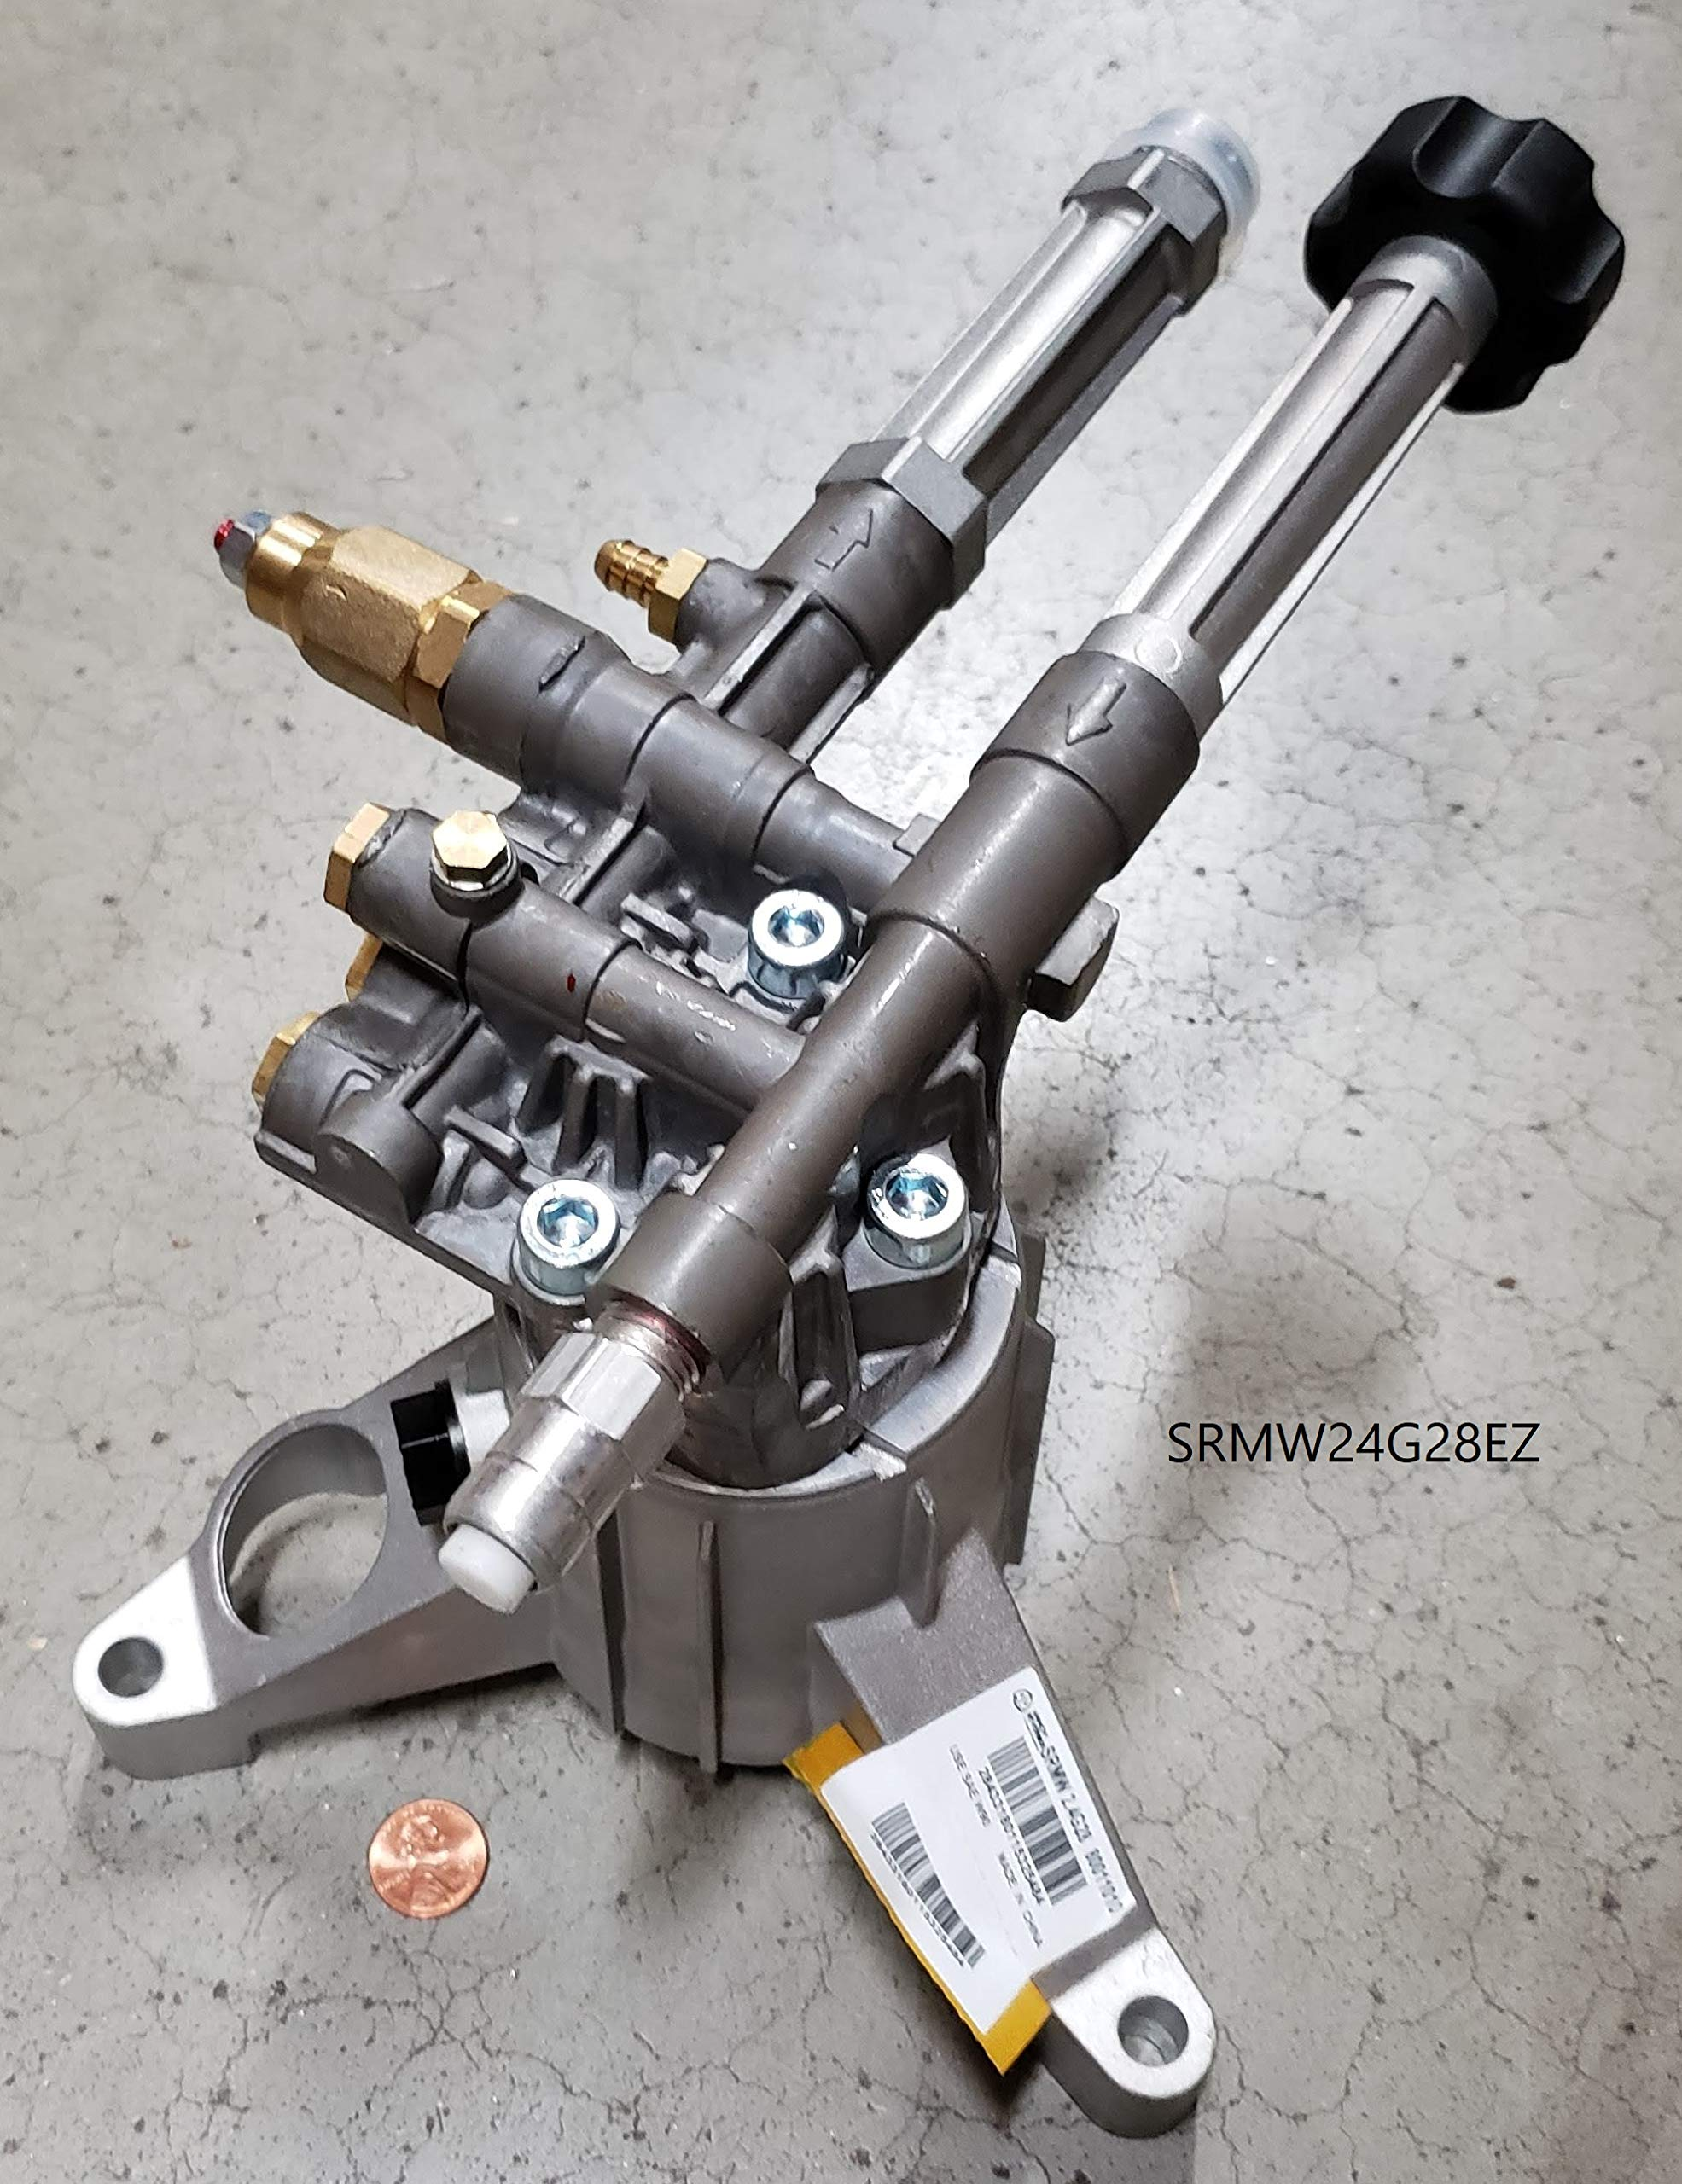 Annovi Reverberi SRMW24G28EZ AR Kit SRMW24G28-EZ, 2.4 GPM, 2800 PSI, Vertical Pump, Natural by Annovi Reverberi